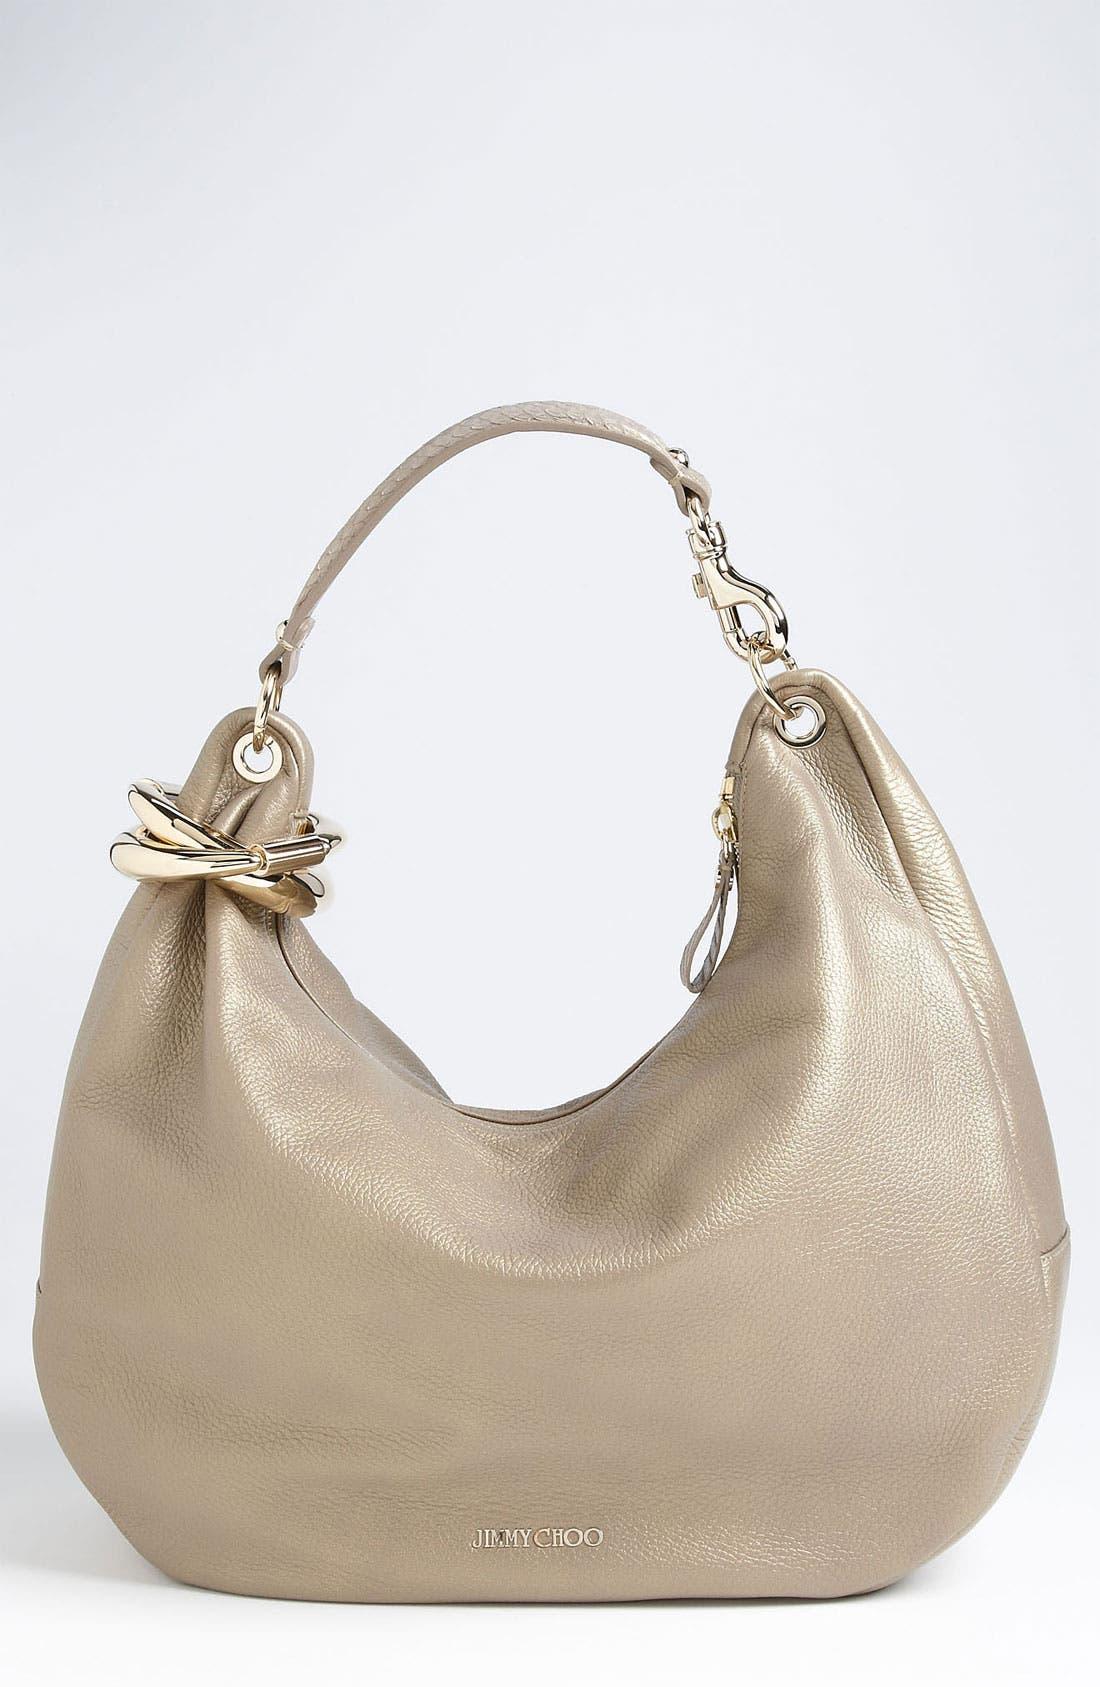 Main Image - Jimmy Choo 'Solar - Large' Pearlized Metallic Leather Hobo